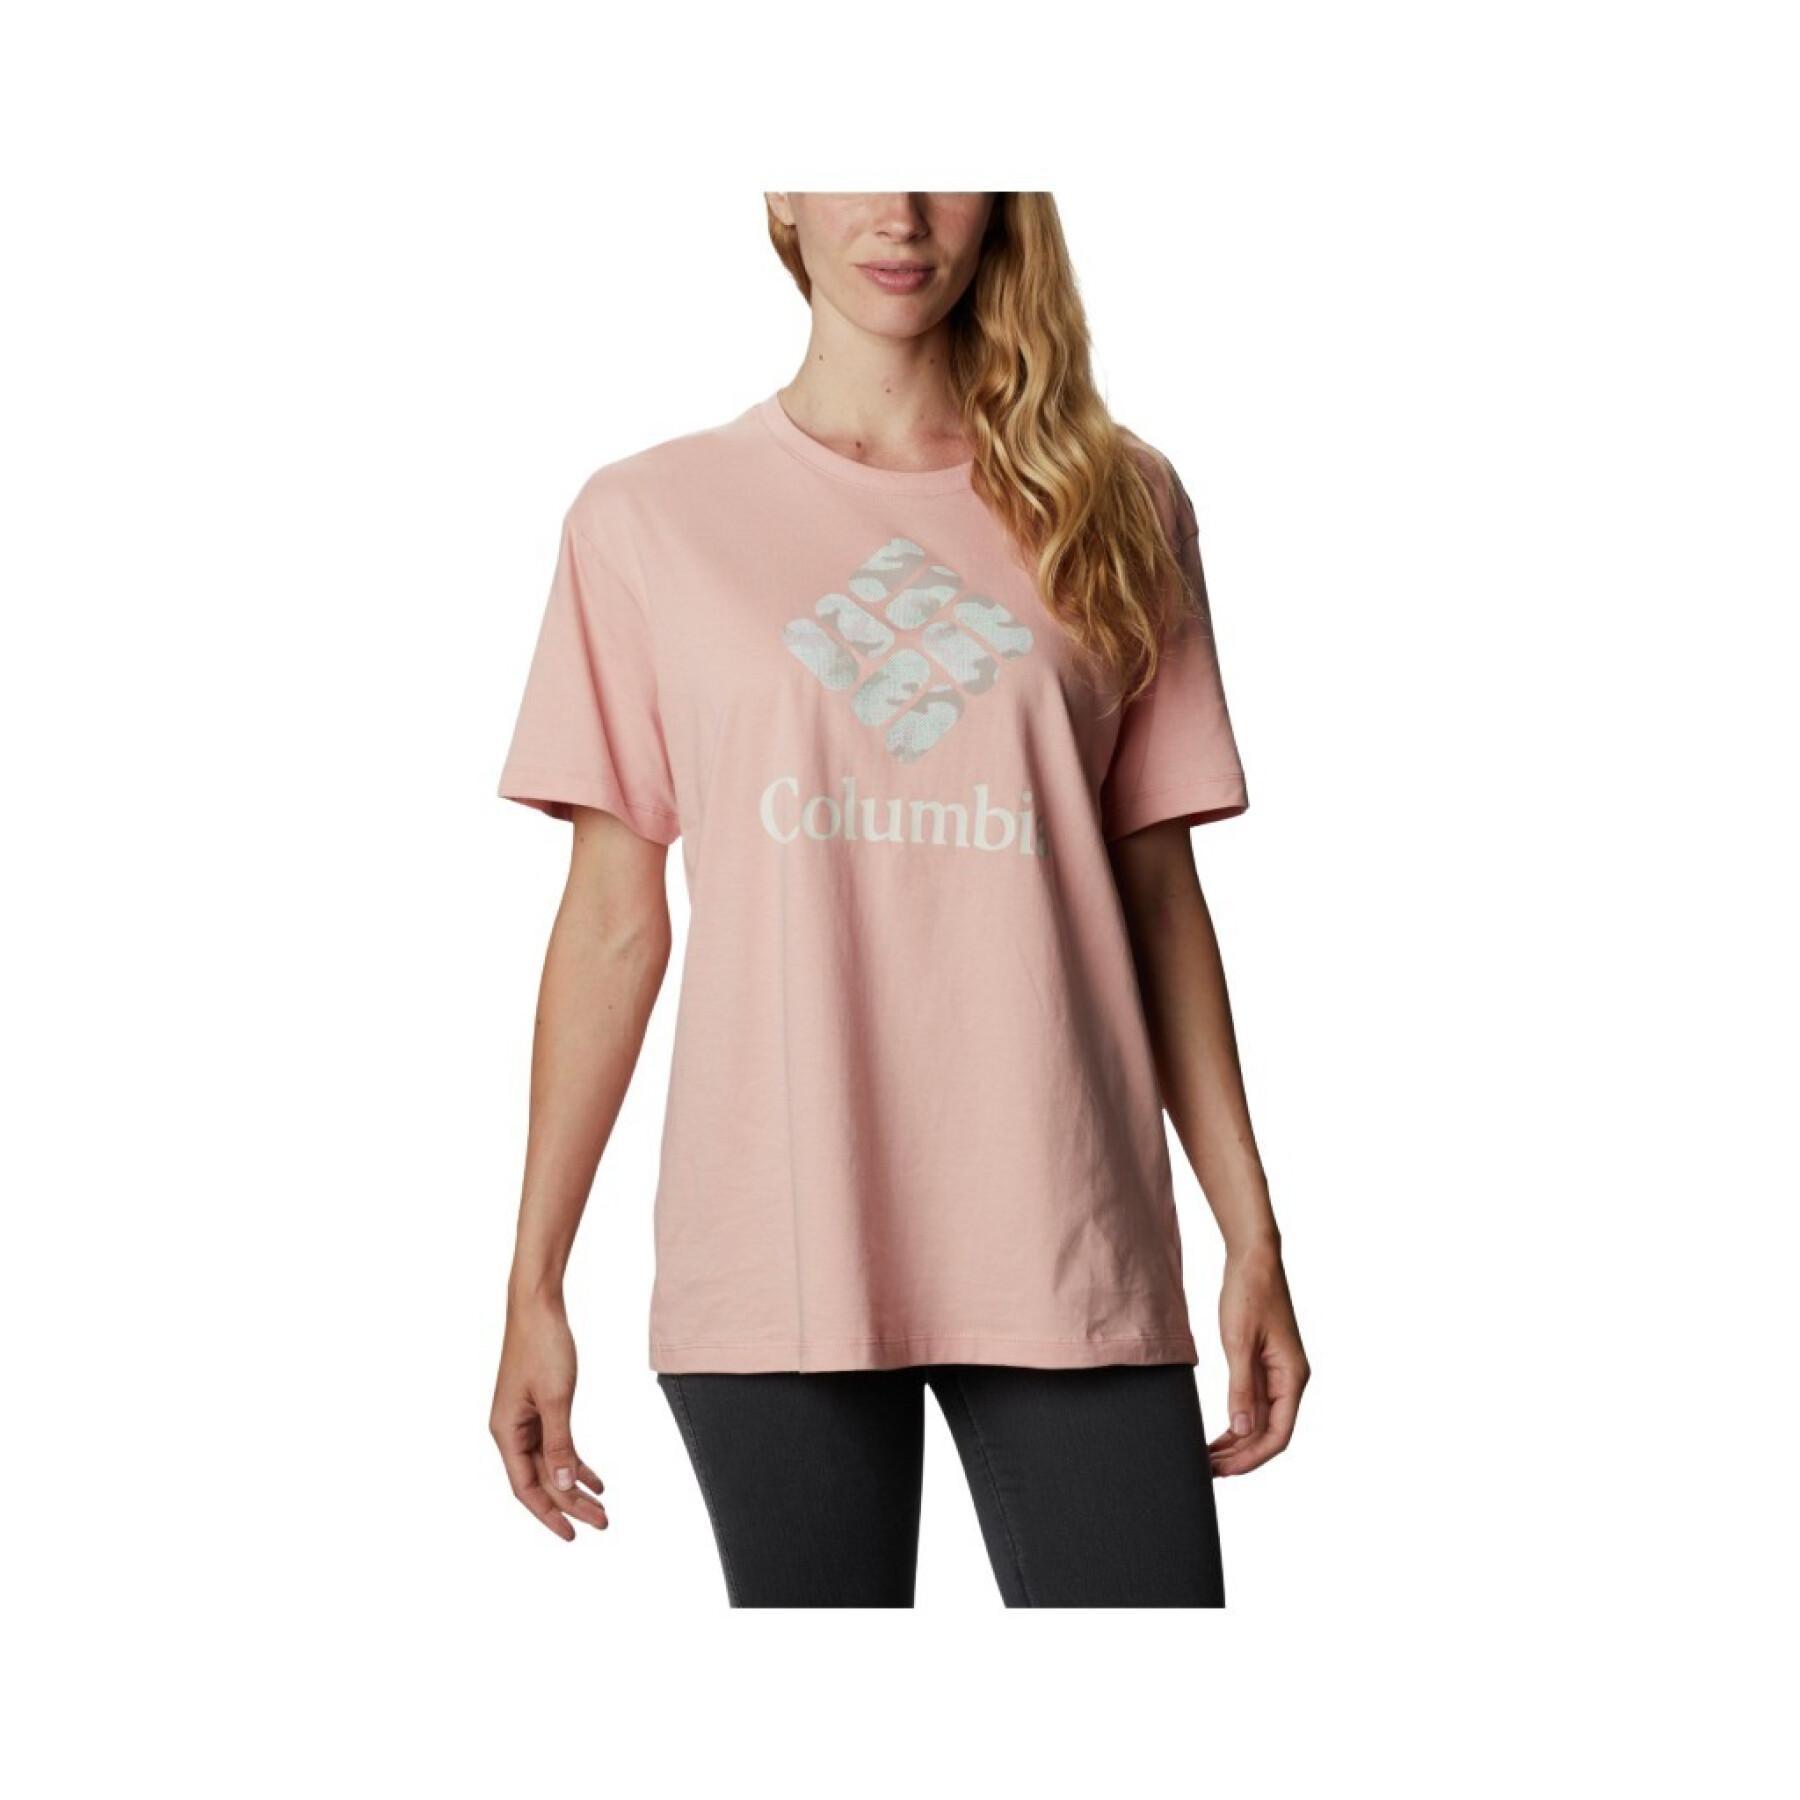 Women's T-shirt Columbia Park Relaxed